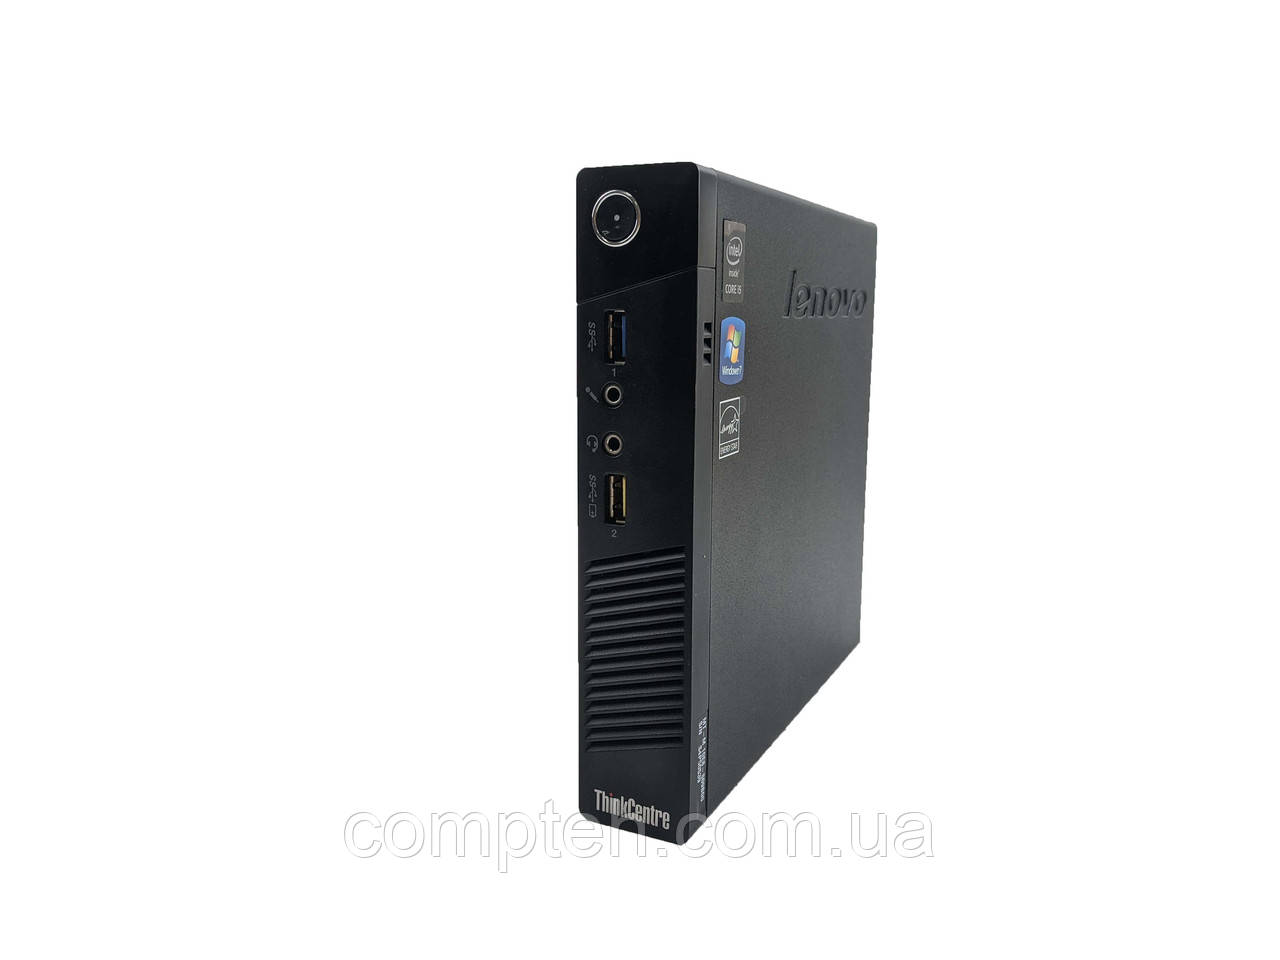 Системный блок Lenovo ThinkCentre M83 USFF